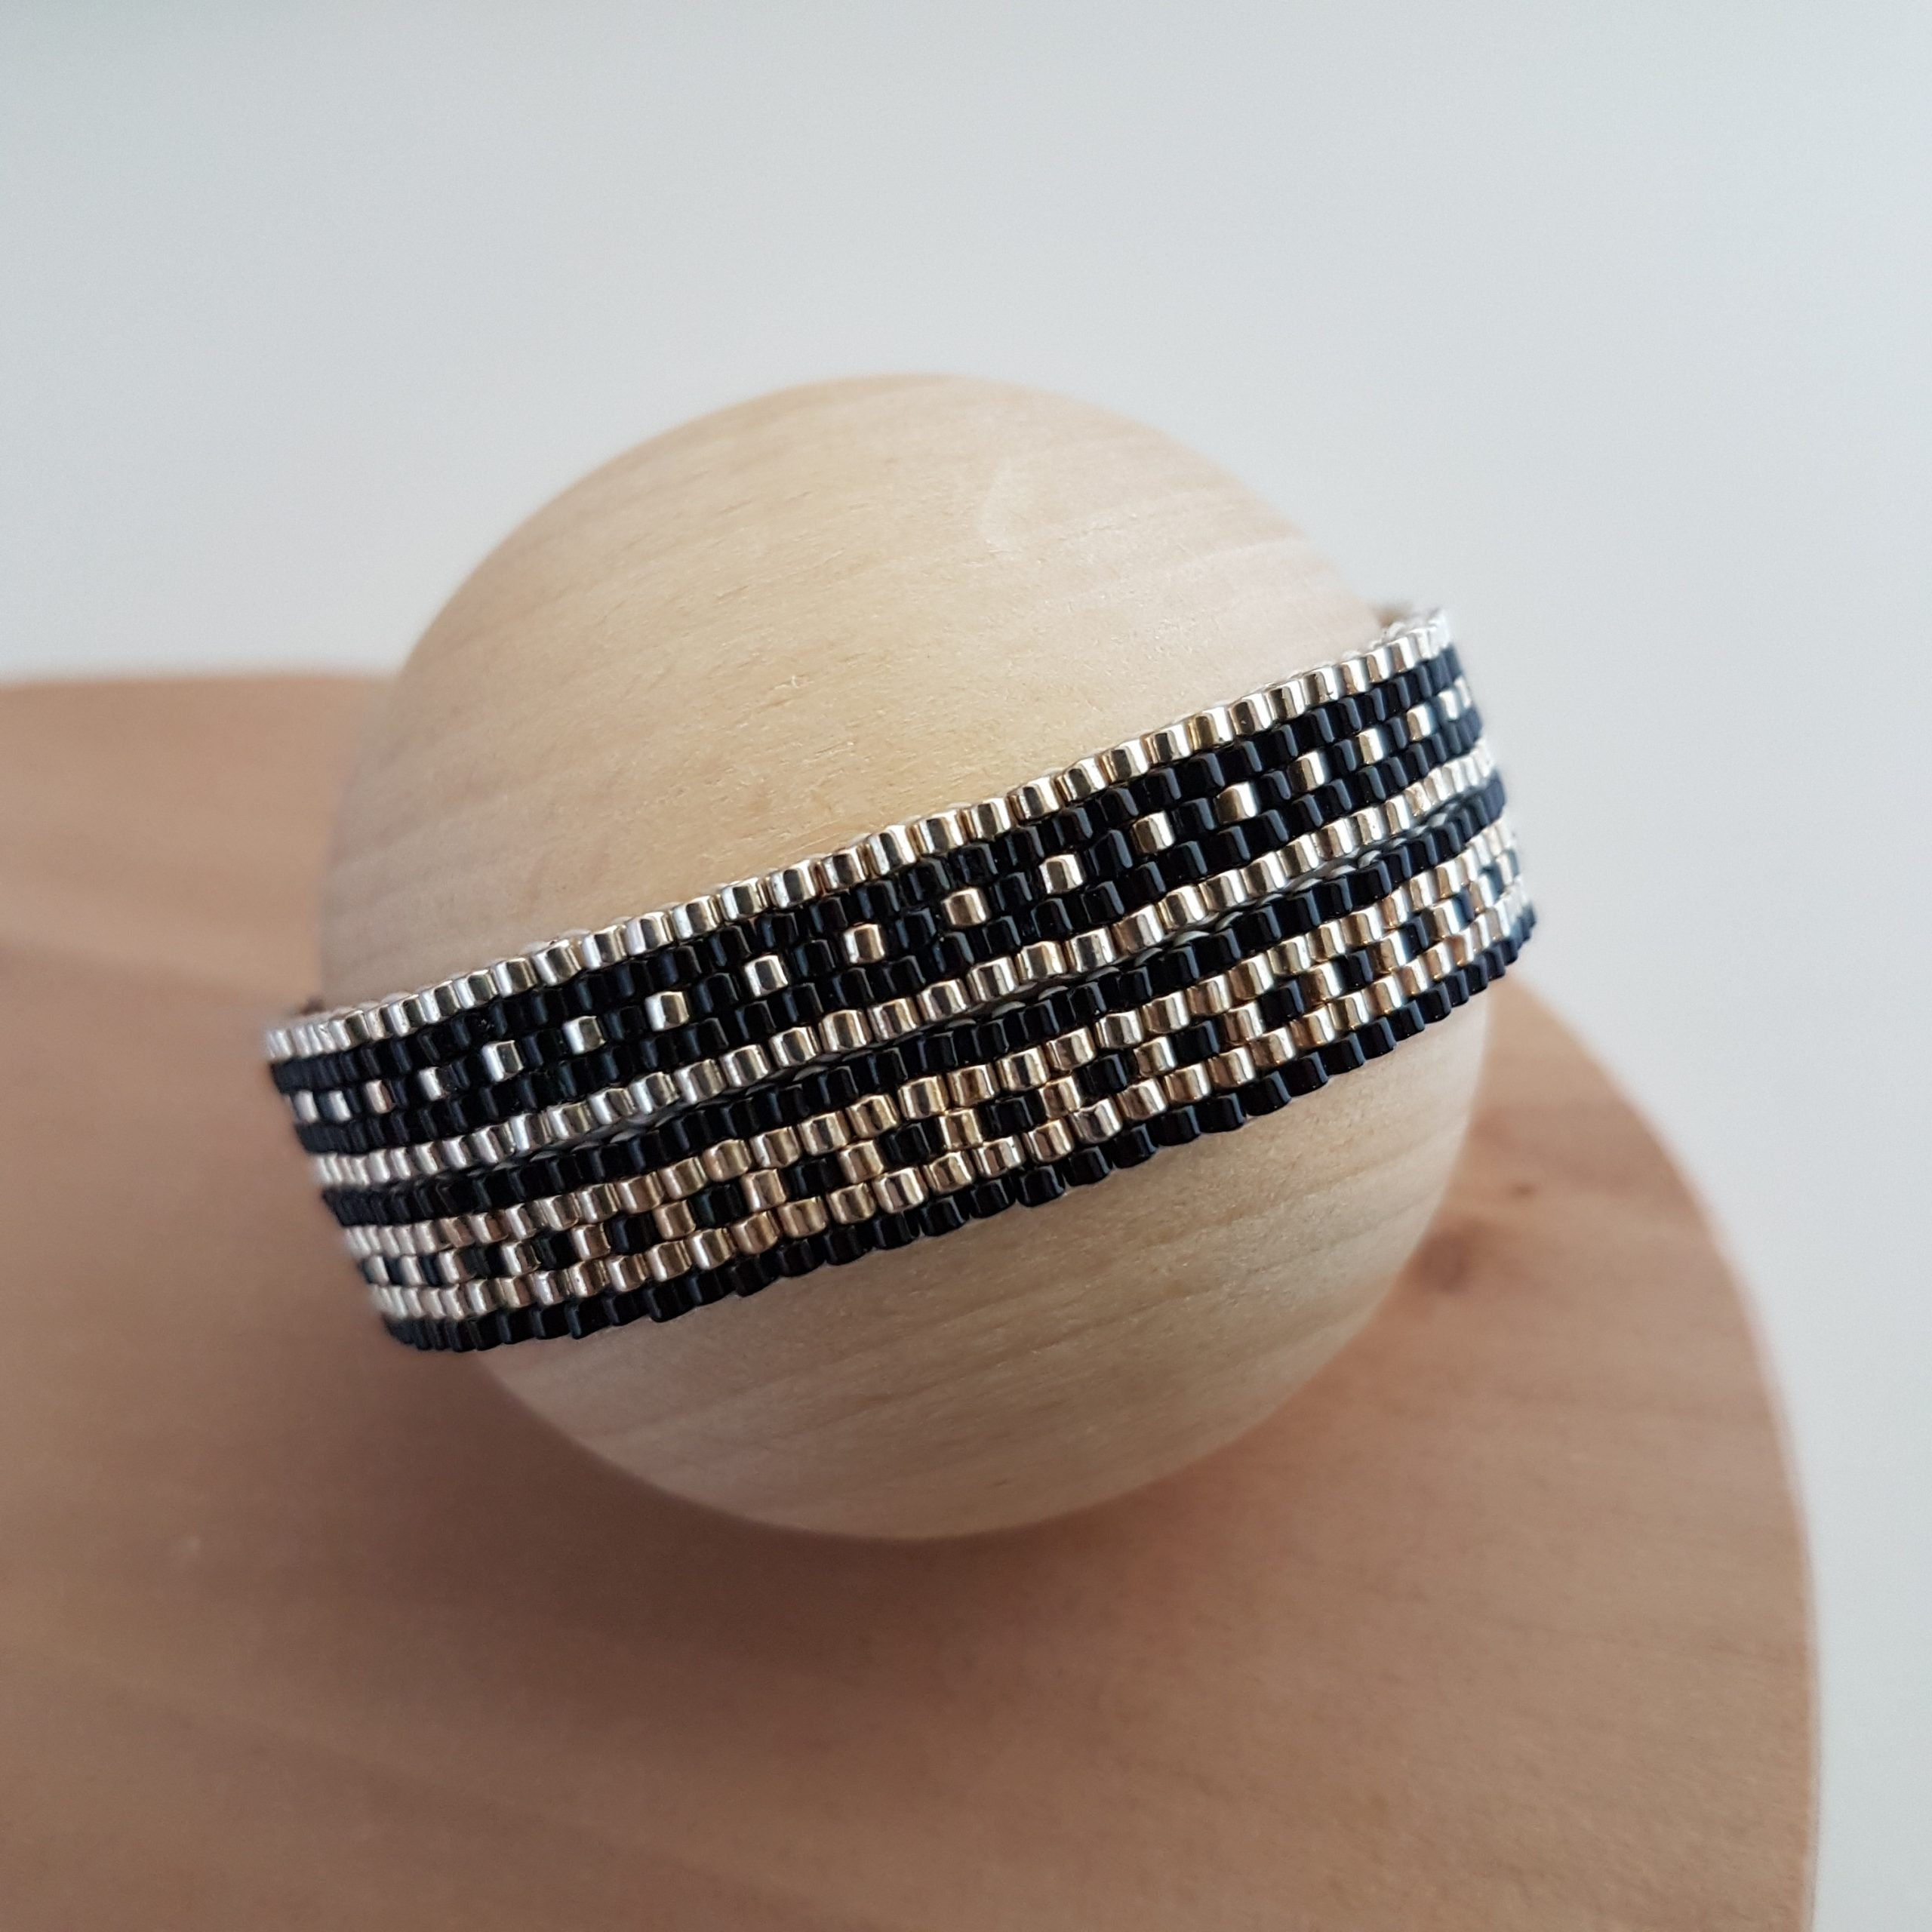 Cadeau Bijou artisanal lyon Bracelet Les cumulables noir argent 925 miyuki